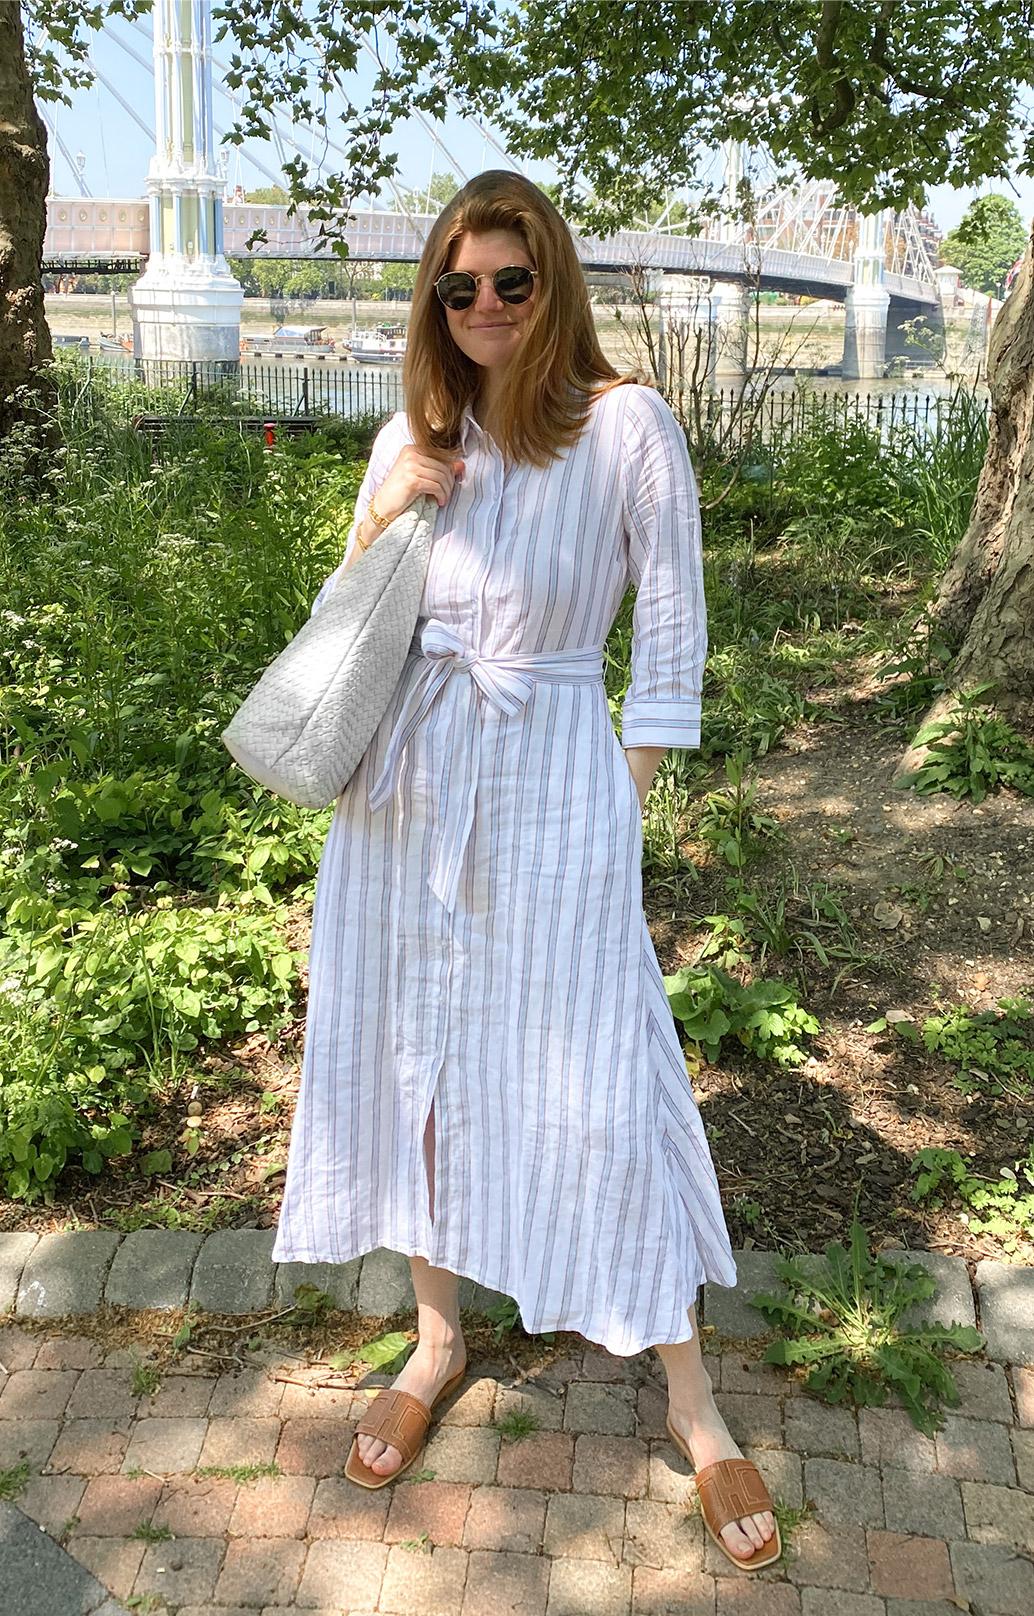 Content creator @molliemoore_ photographed at Battersea Park in London wearing Hobbs' Ciara linen dress.